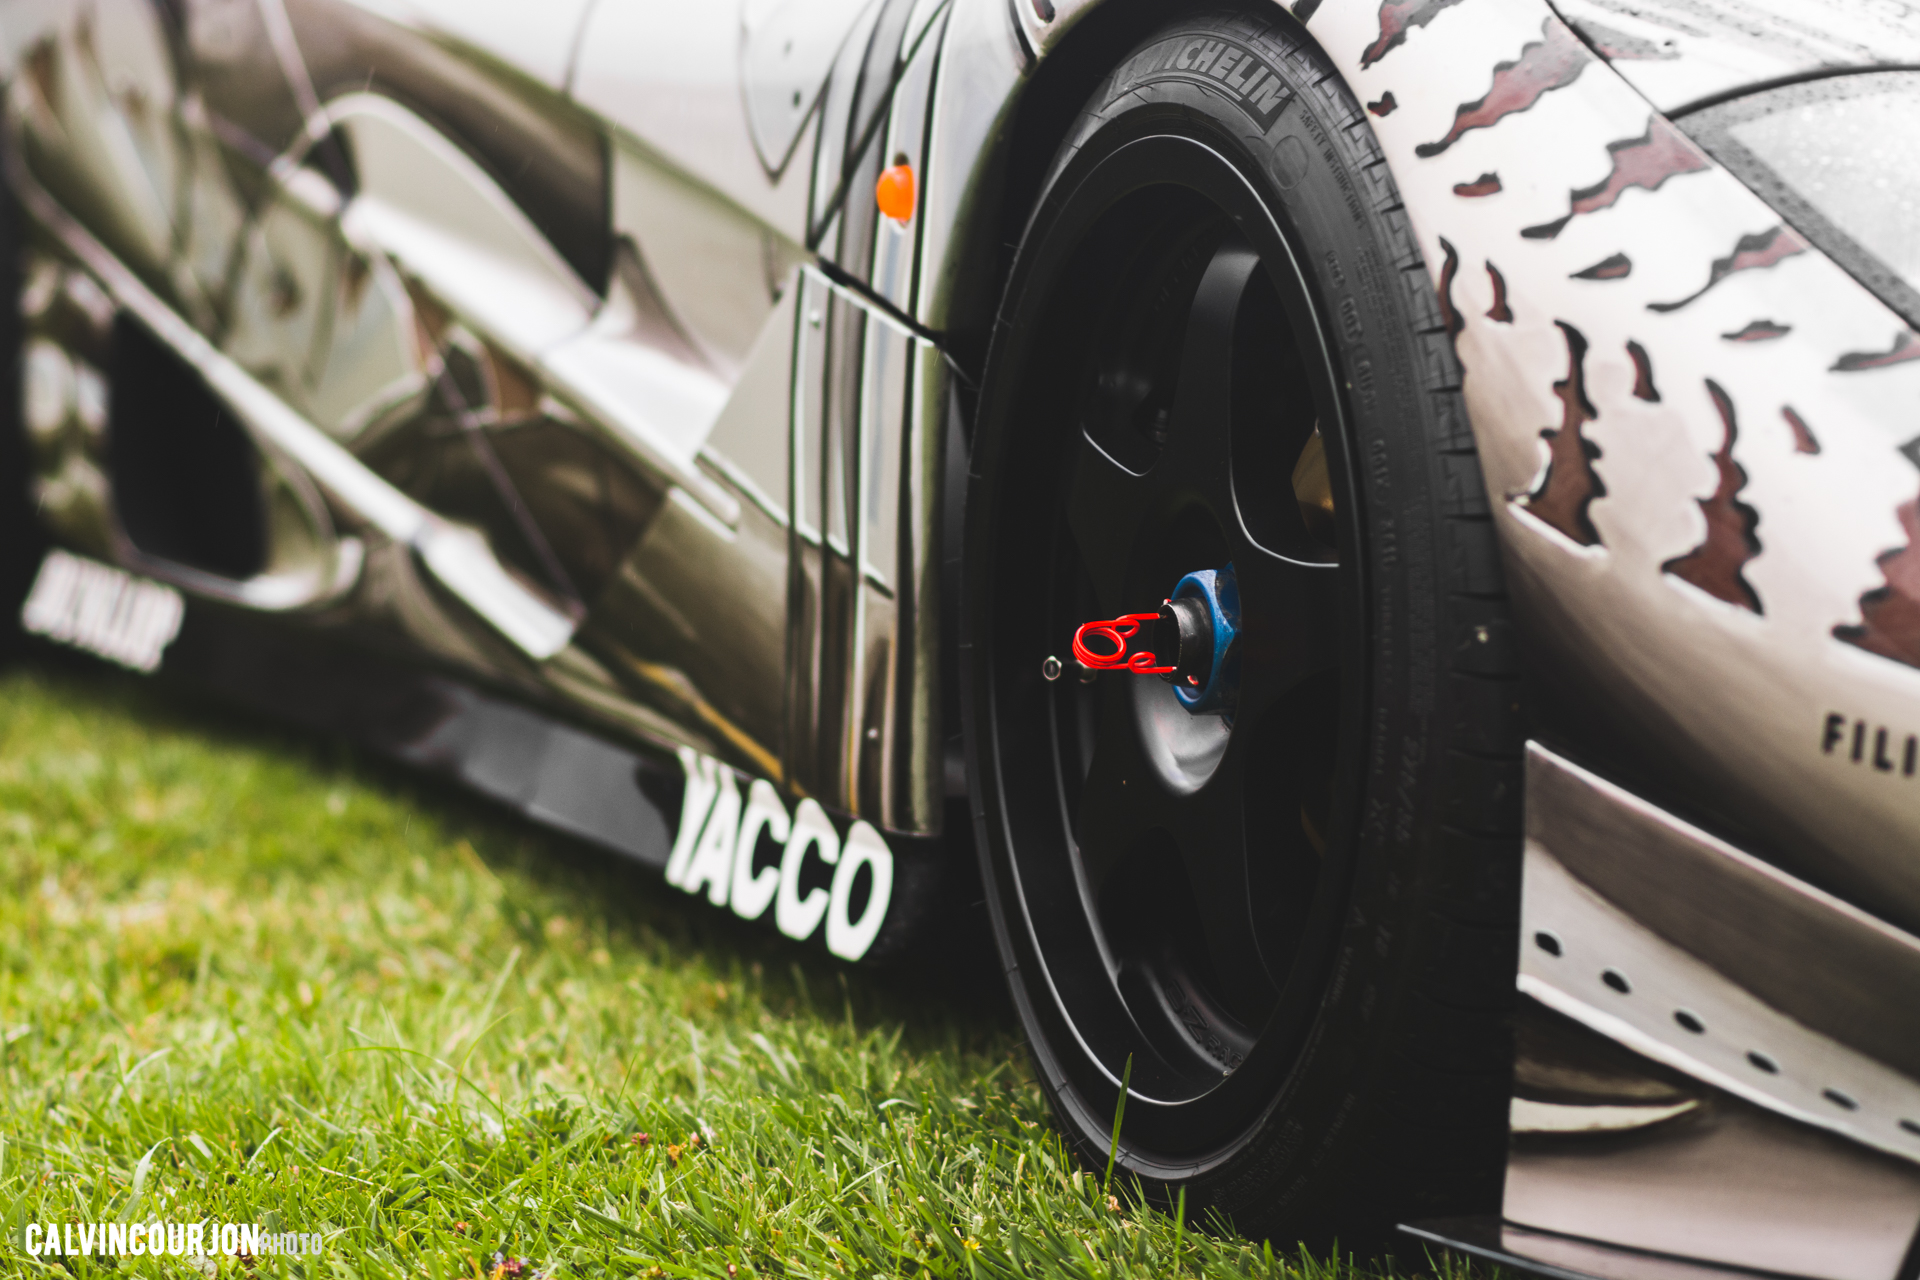 McLaren F1 (1995) – Cesar - side view wheel / jante, vue de côté - Chantilly 2015 – photo Calvin Courjon